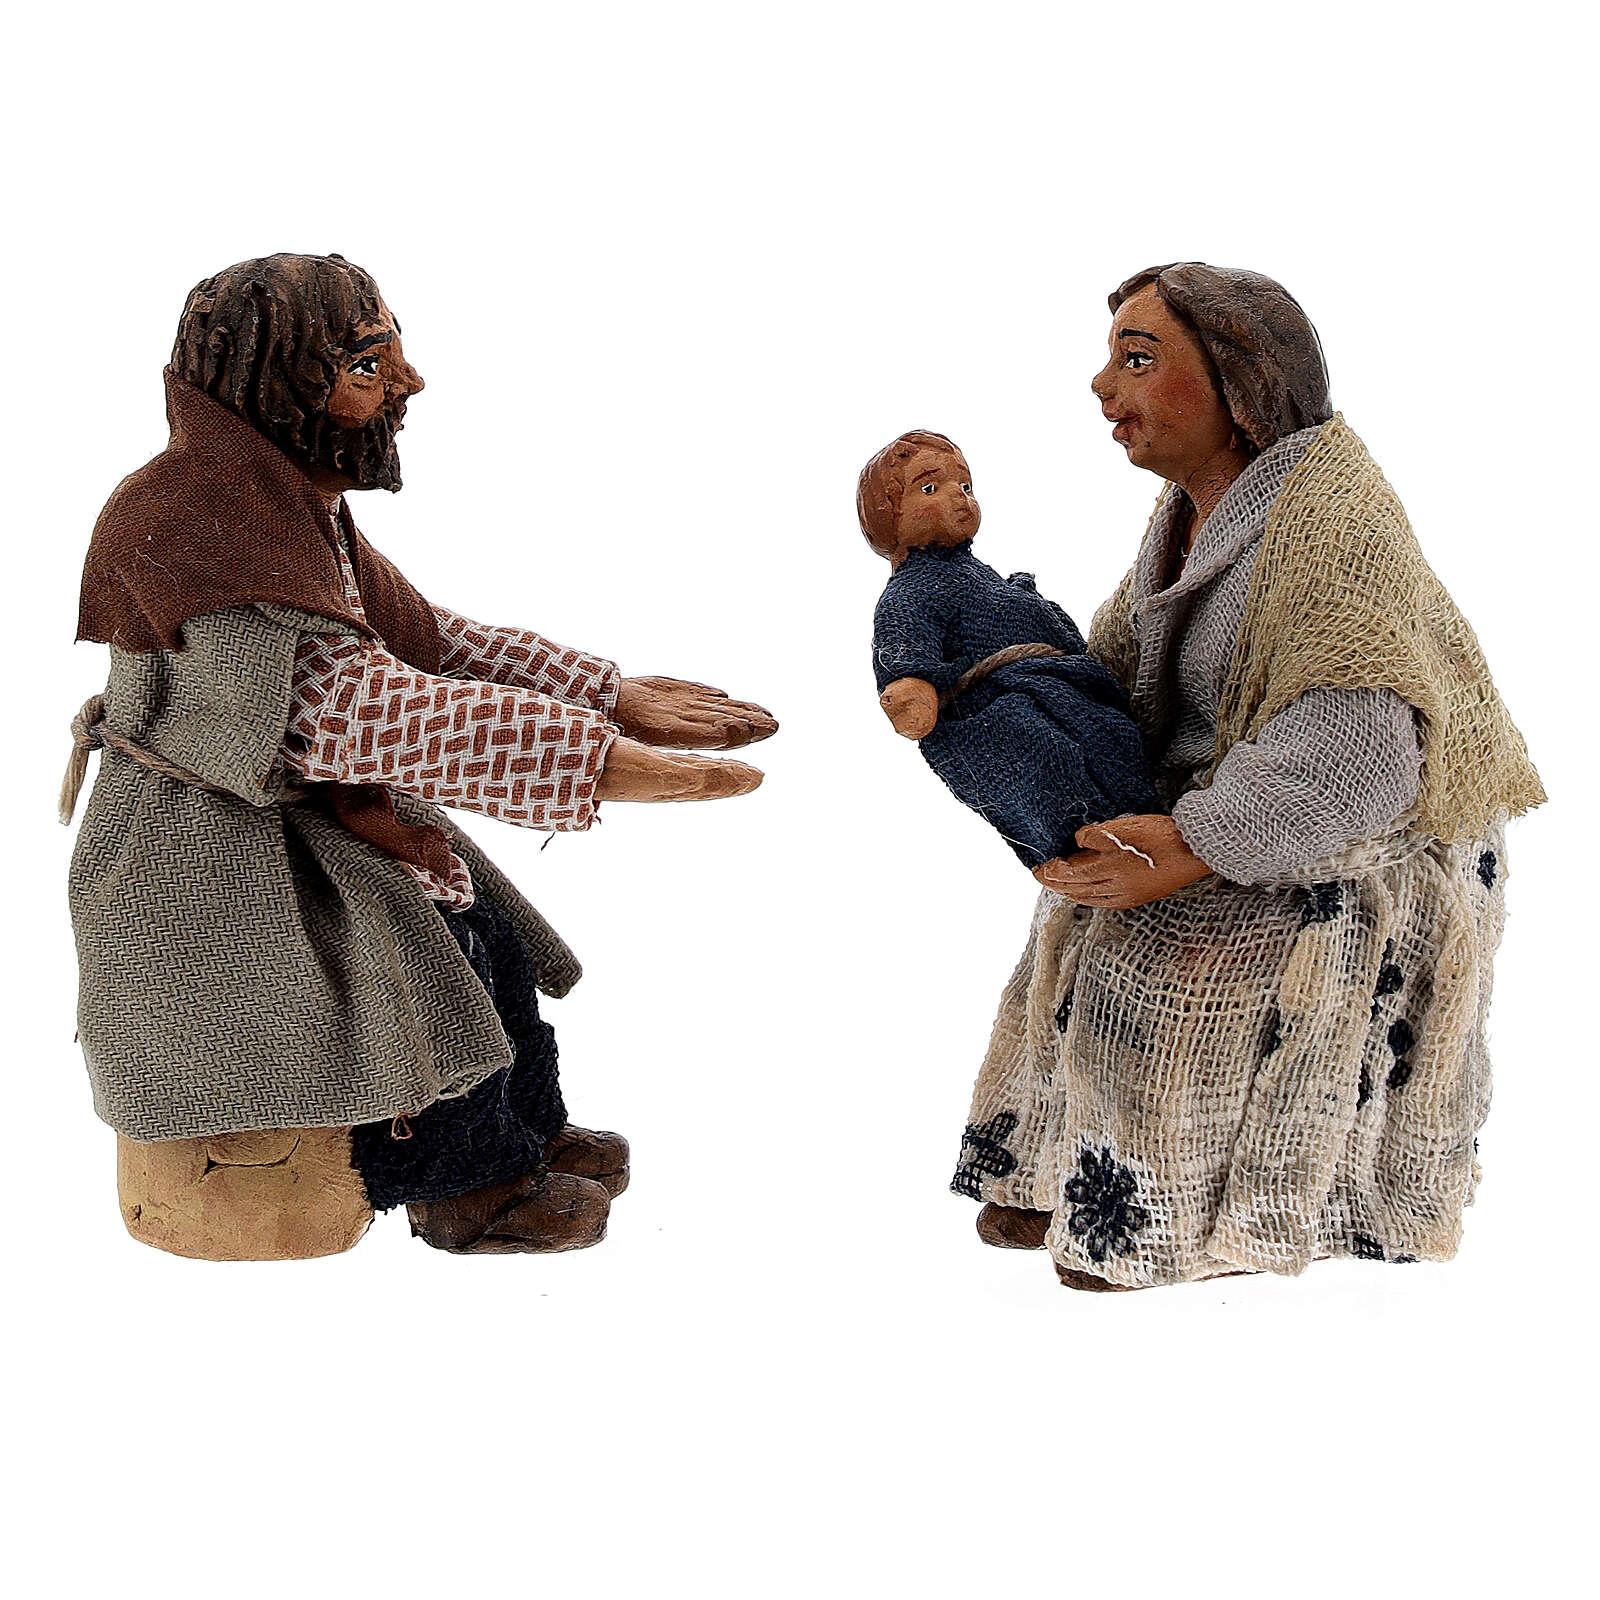 Family with child scene Neapolitan Nativity Scene figurines 10 cm 4